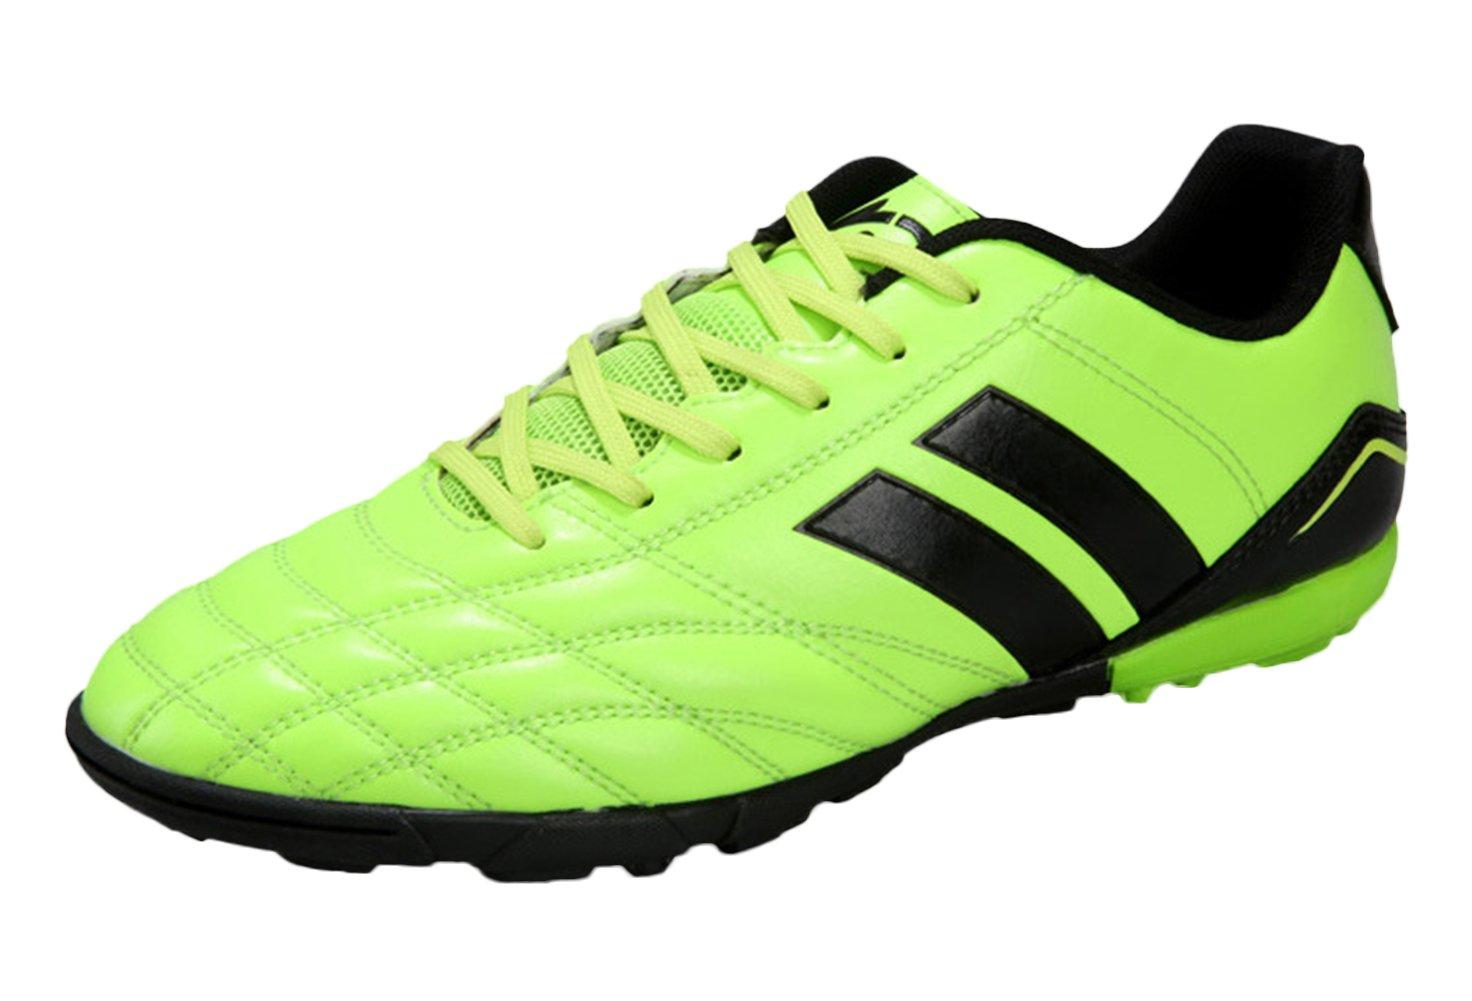 SK Studioメンズスポーツライト重量インドアアウトドアレースアップサッカー靴AG TF B01M1GUQSL 7.5 D(M) US|グリーン グリーン 7.5 D(M) US